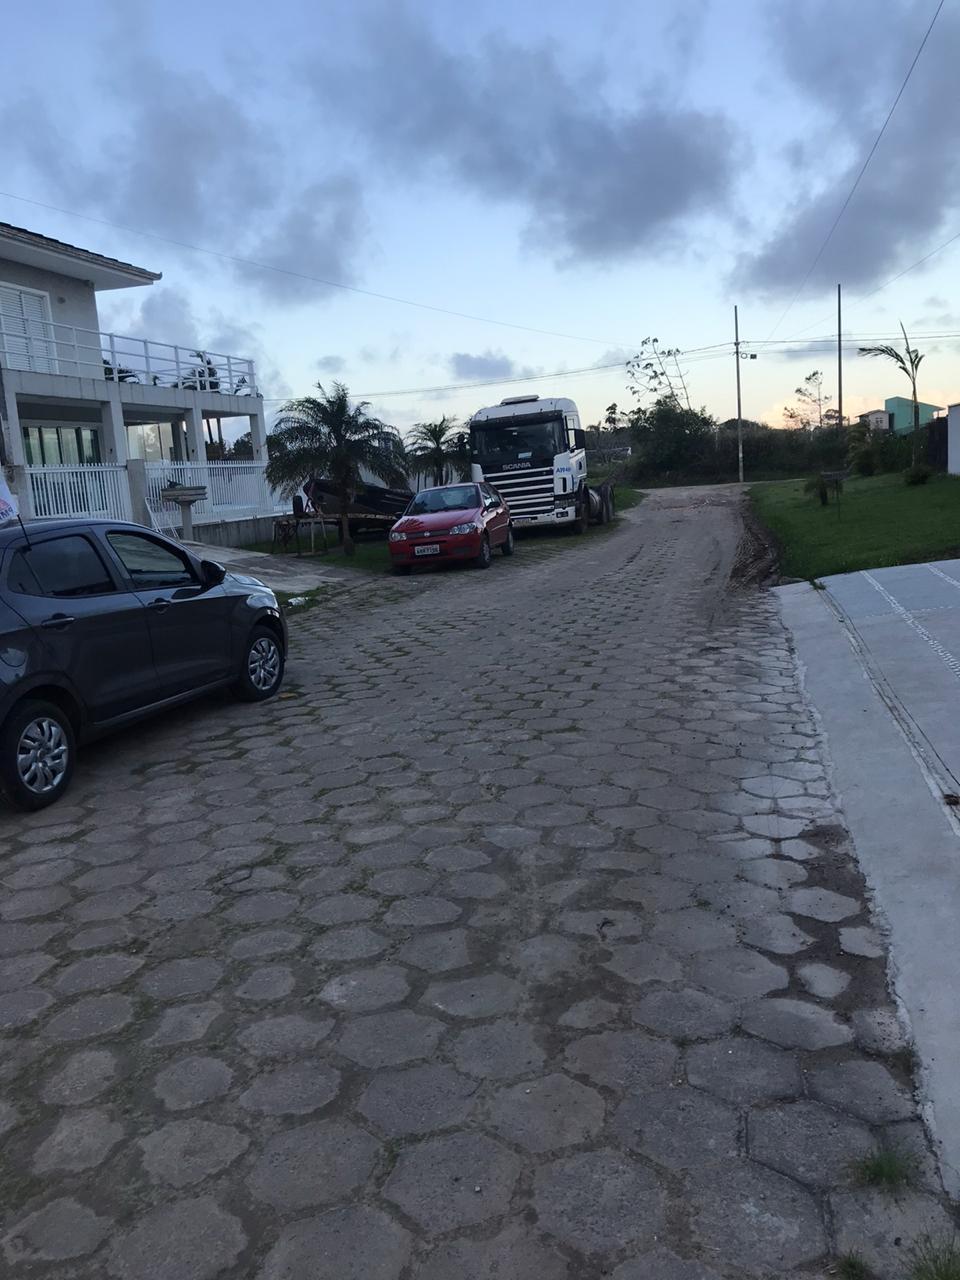 https://s3-sa-east-1.amazonaws.com/static-arbo/TE0011_SAFI/terrenoavendaataminortepontaldoparanapr_1607378120188.jpg